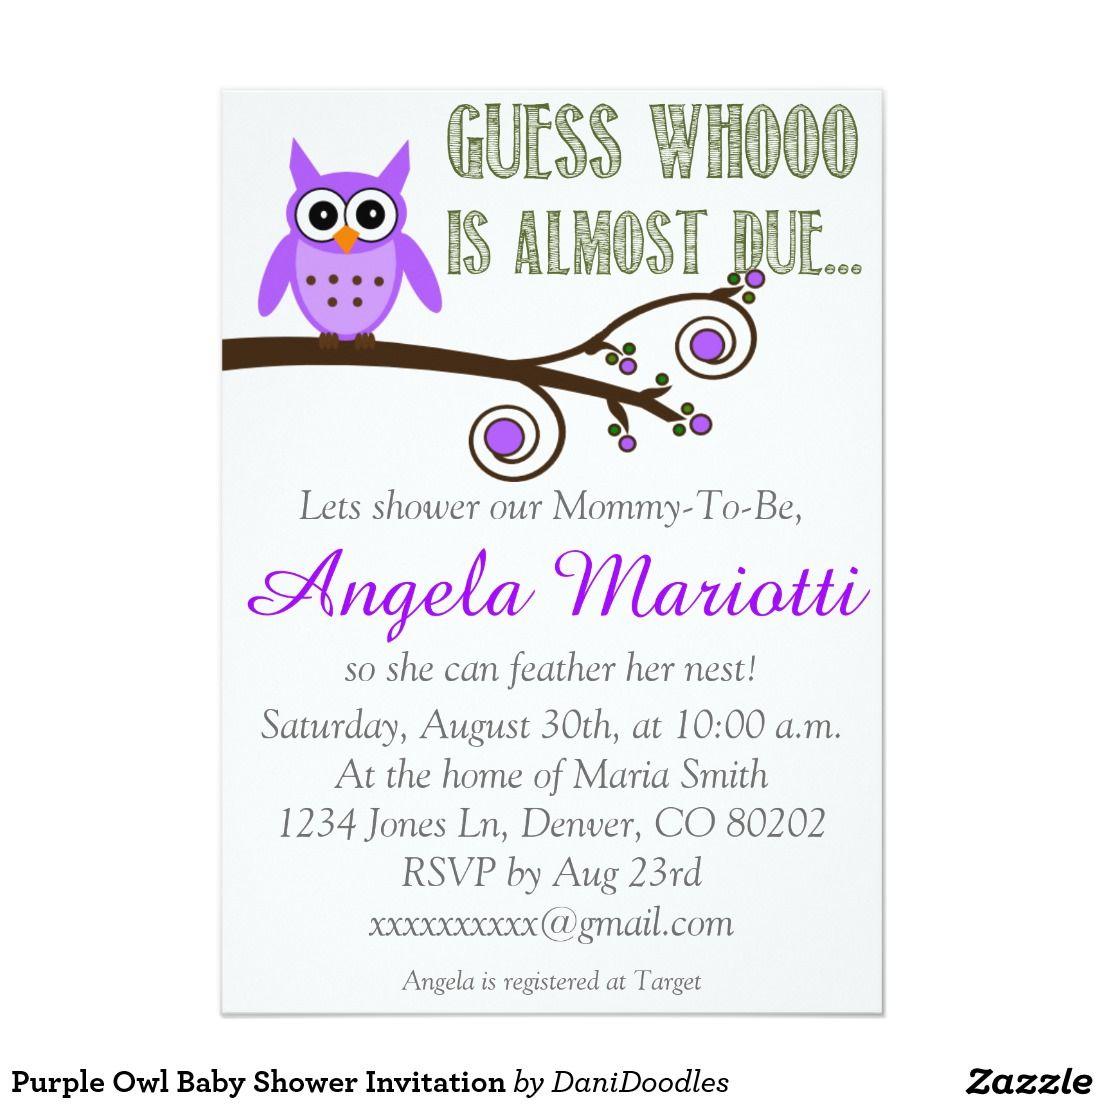 Purple Owl Baby Shower Invitation | Zazzle invitations and Shower ...